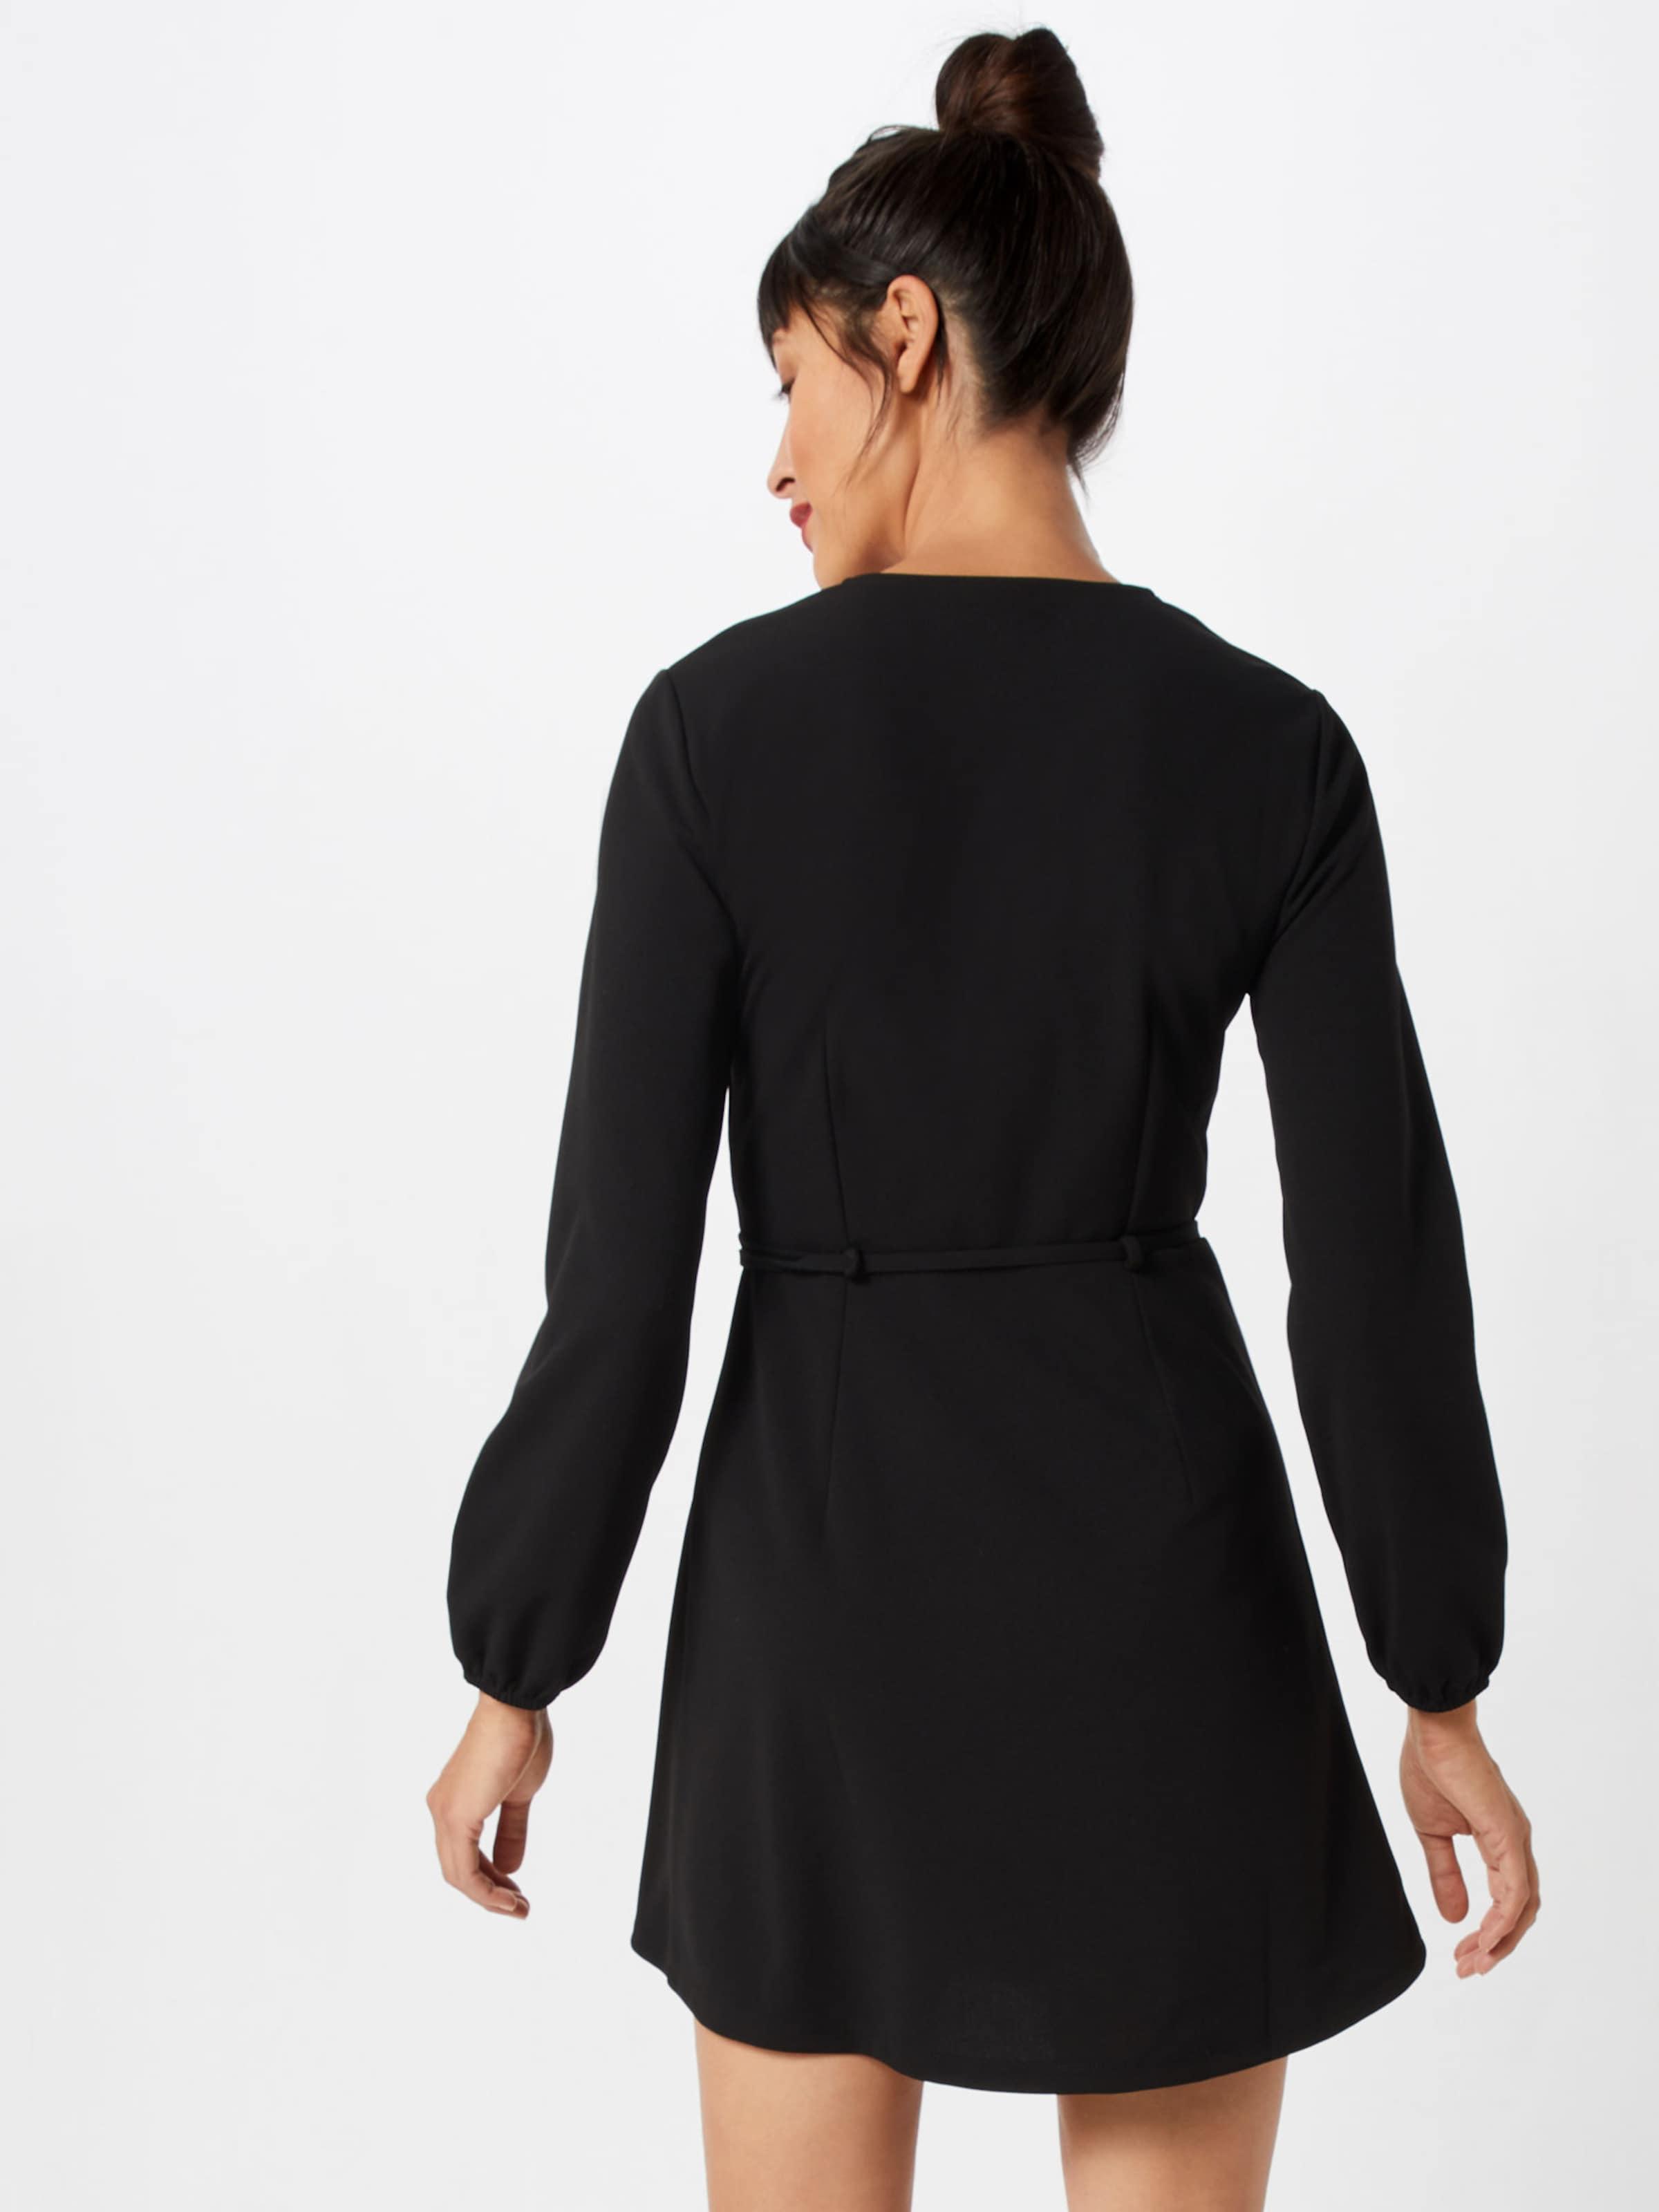 Jrs' Noir En De Dress s Jacqueline L Robe 'jdylauren Yong Belt 0kOPN8nwX